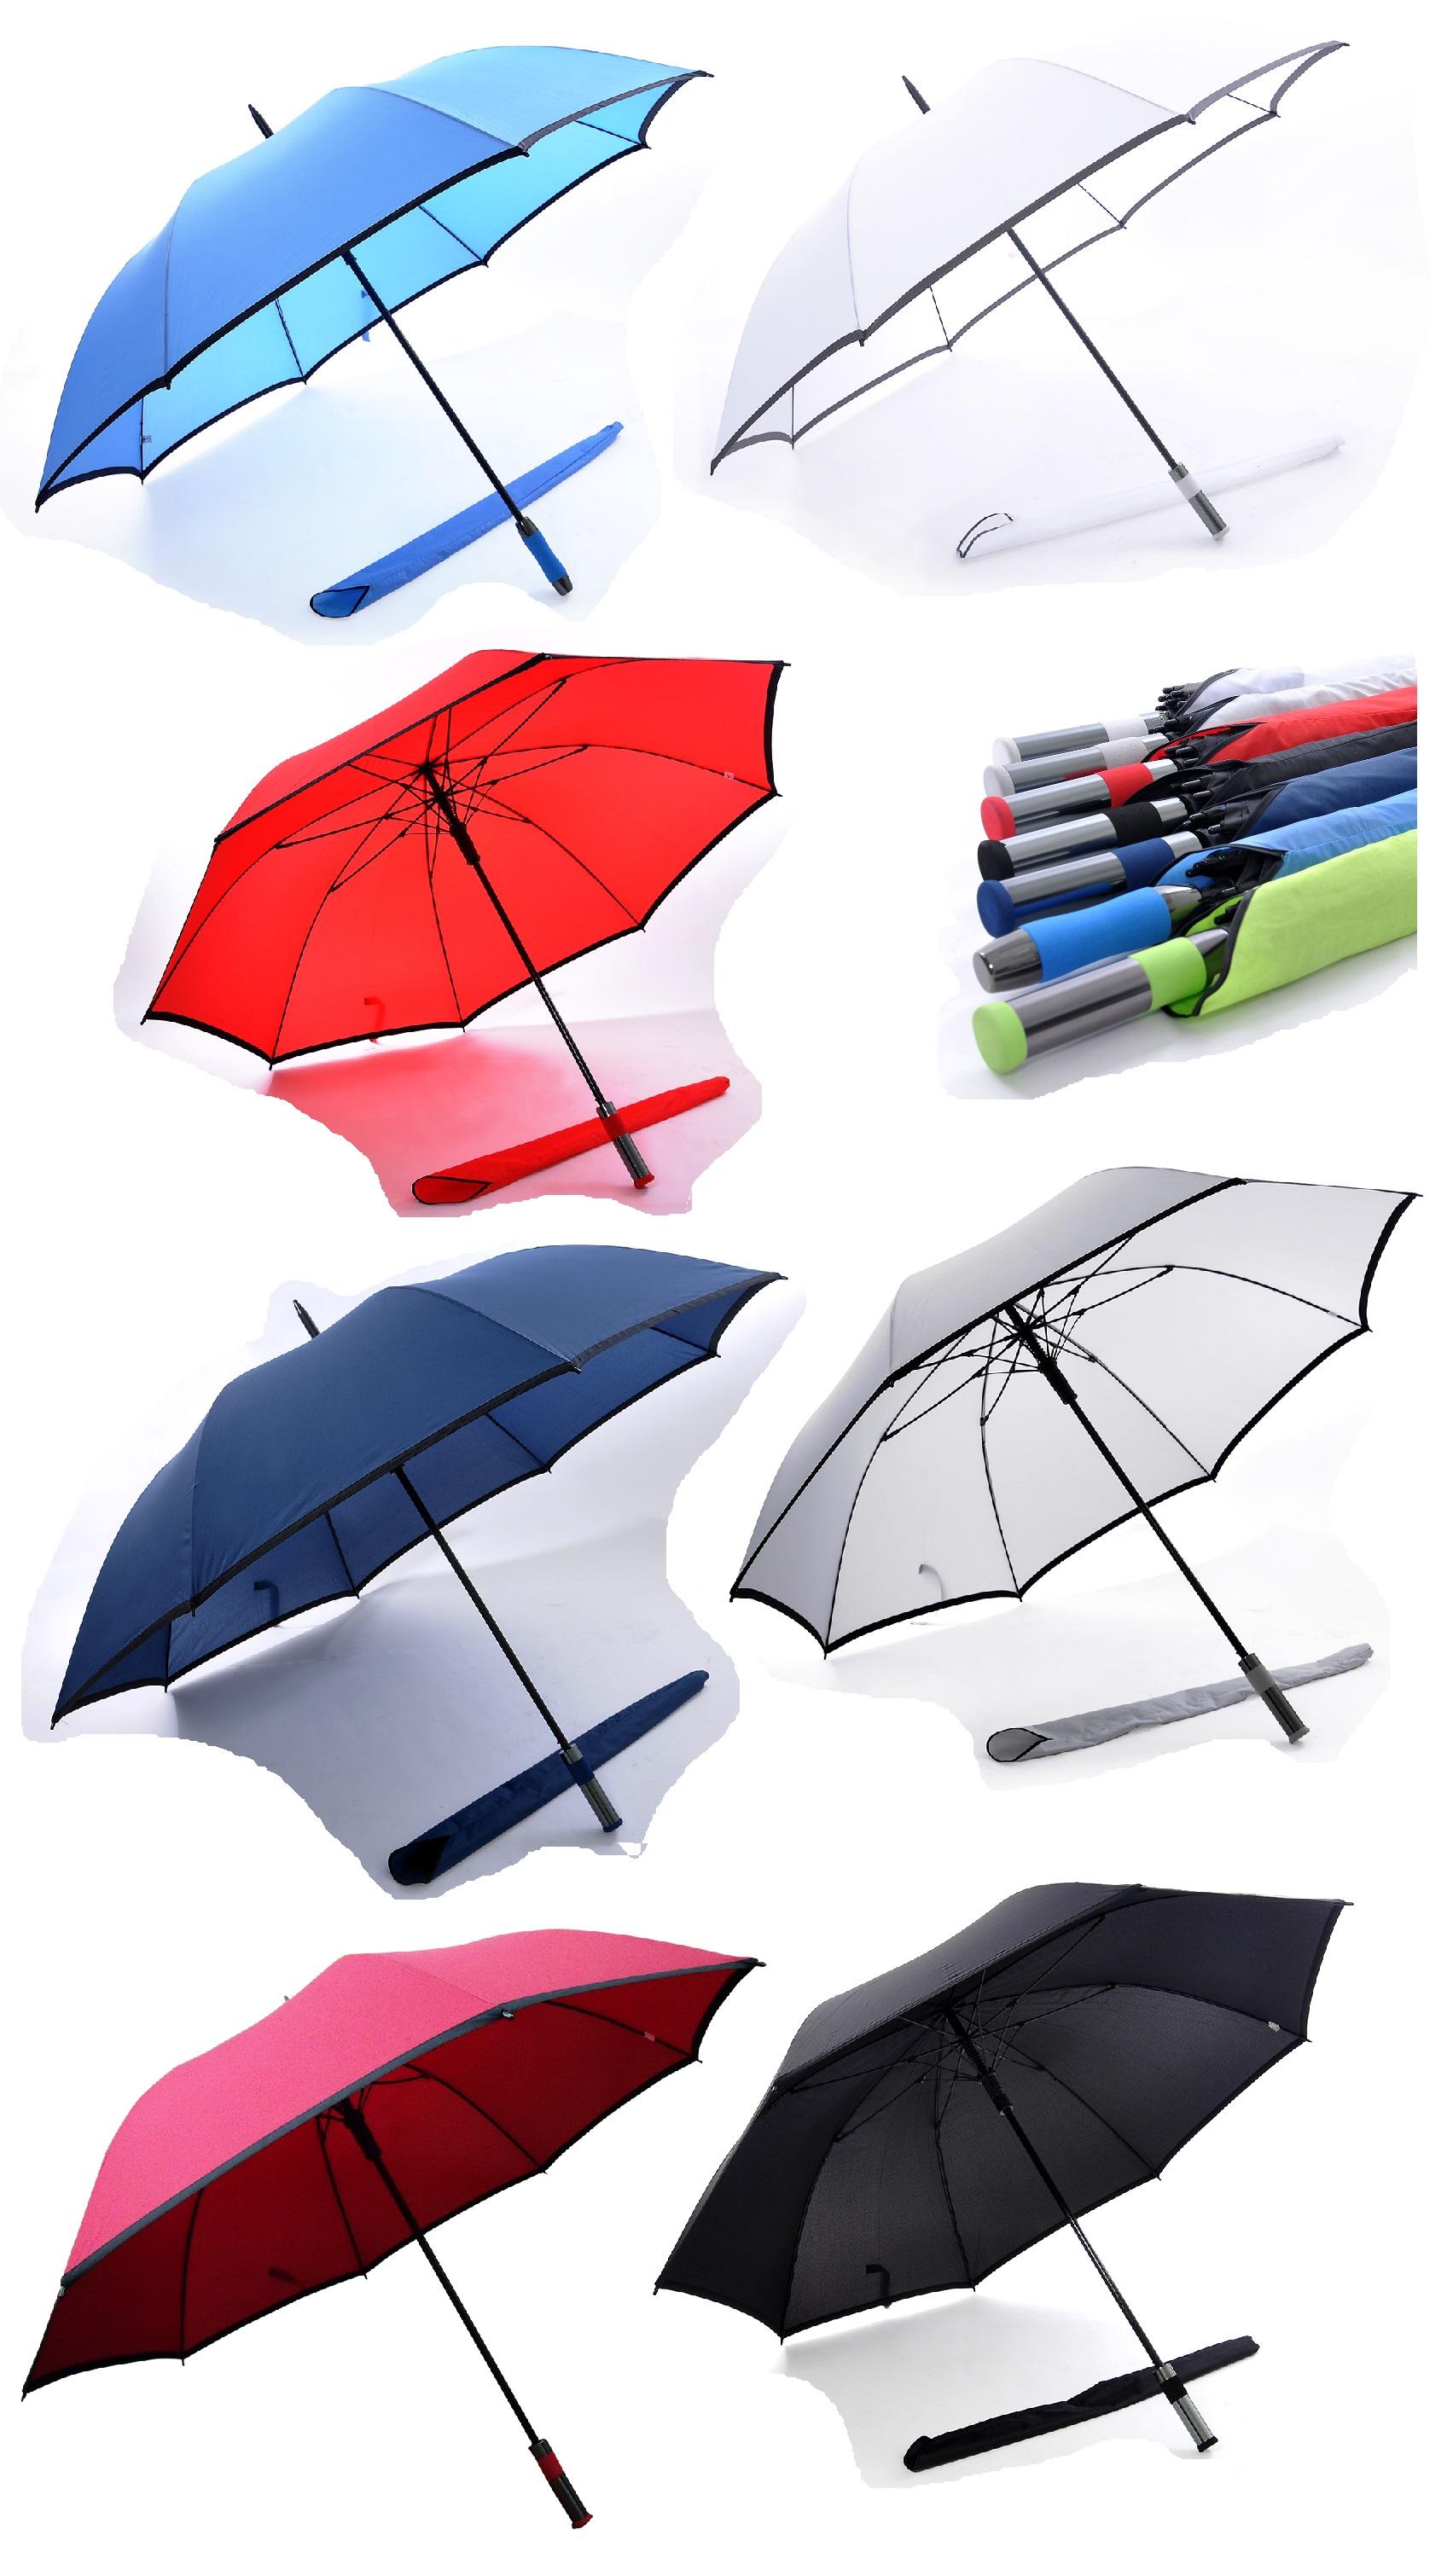 30inch Golf Umbrella with Black / Grey Trimming